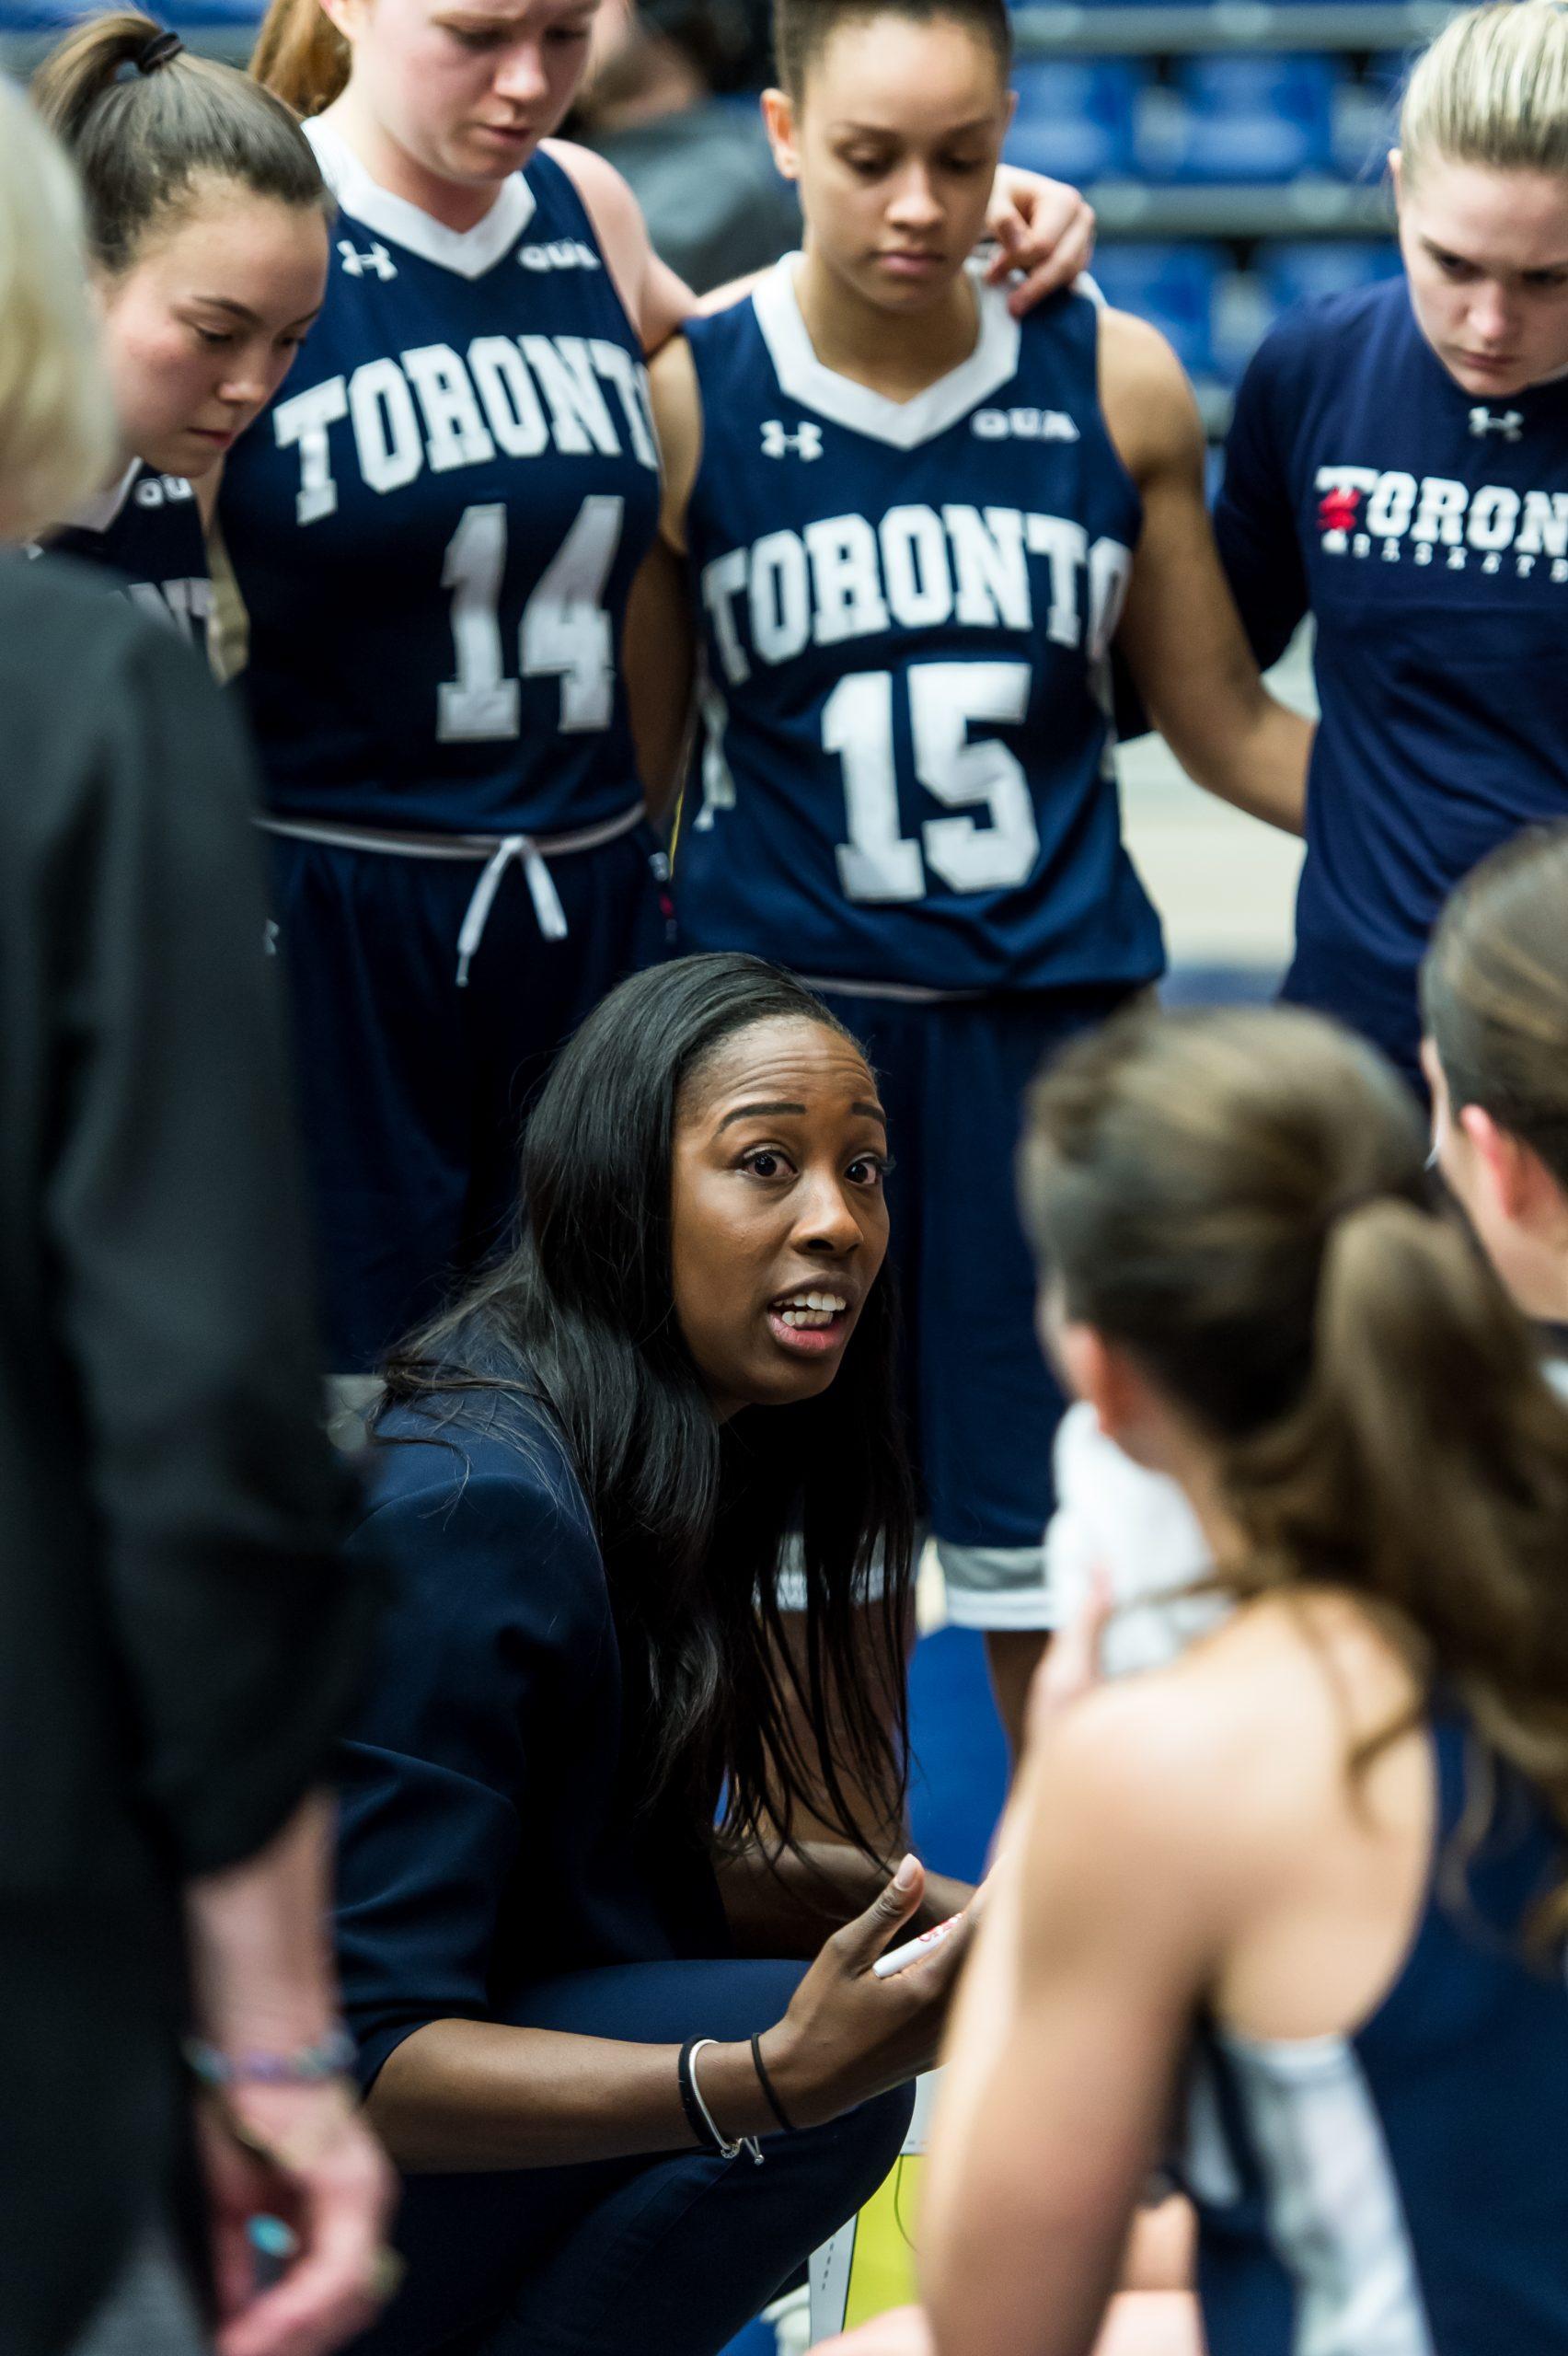 Former Olympian Tamara Tatham named U of T's full-time women's head coach